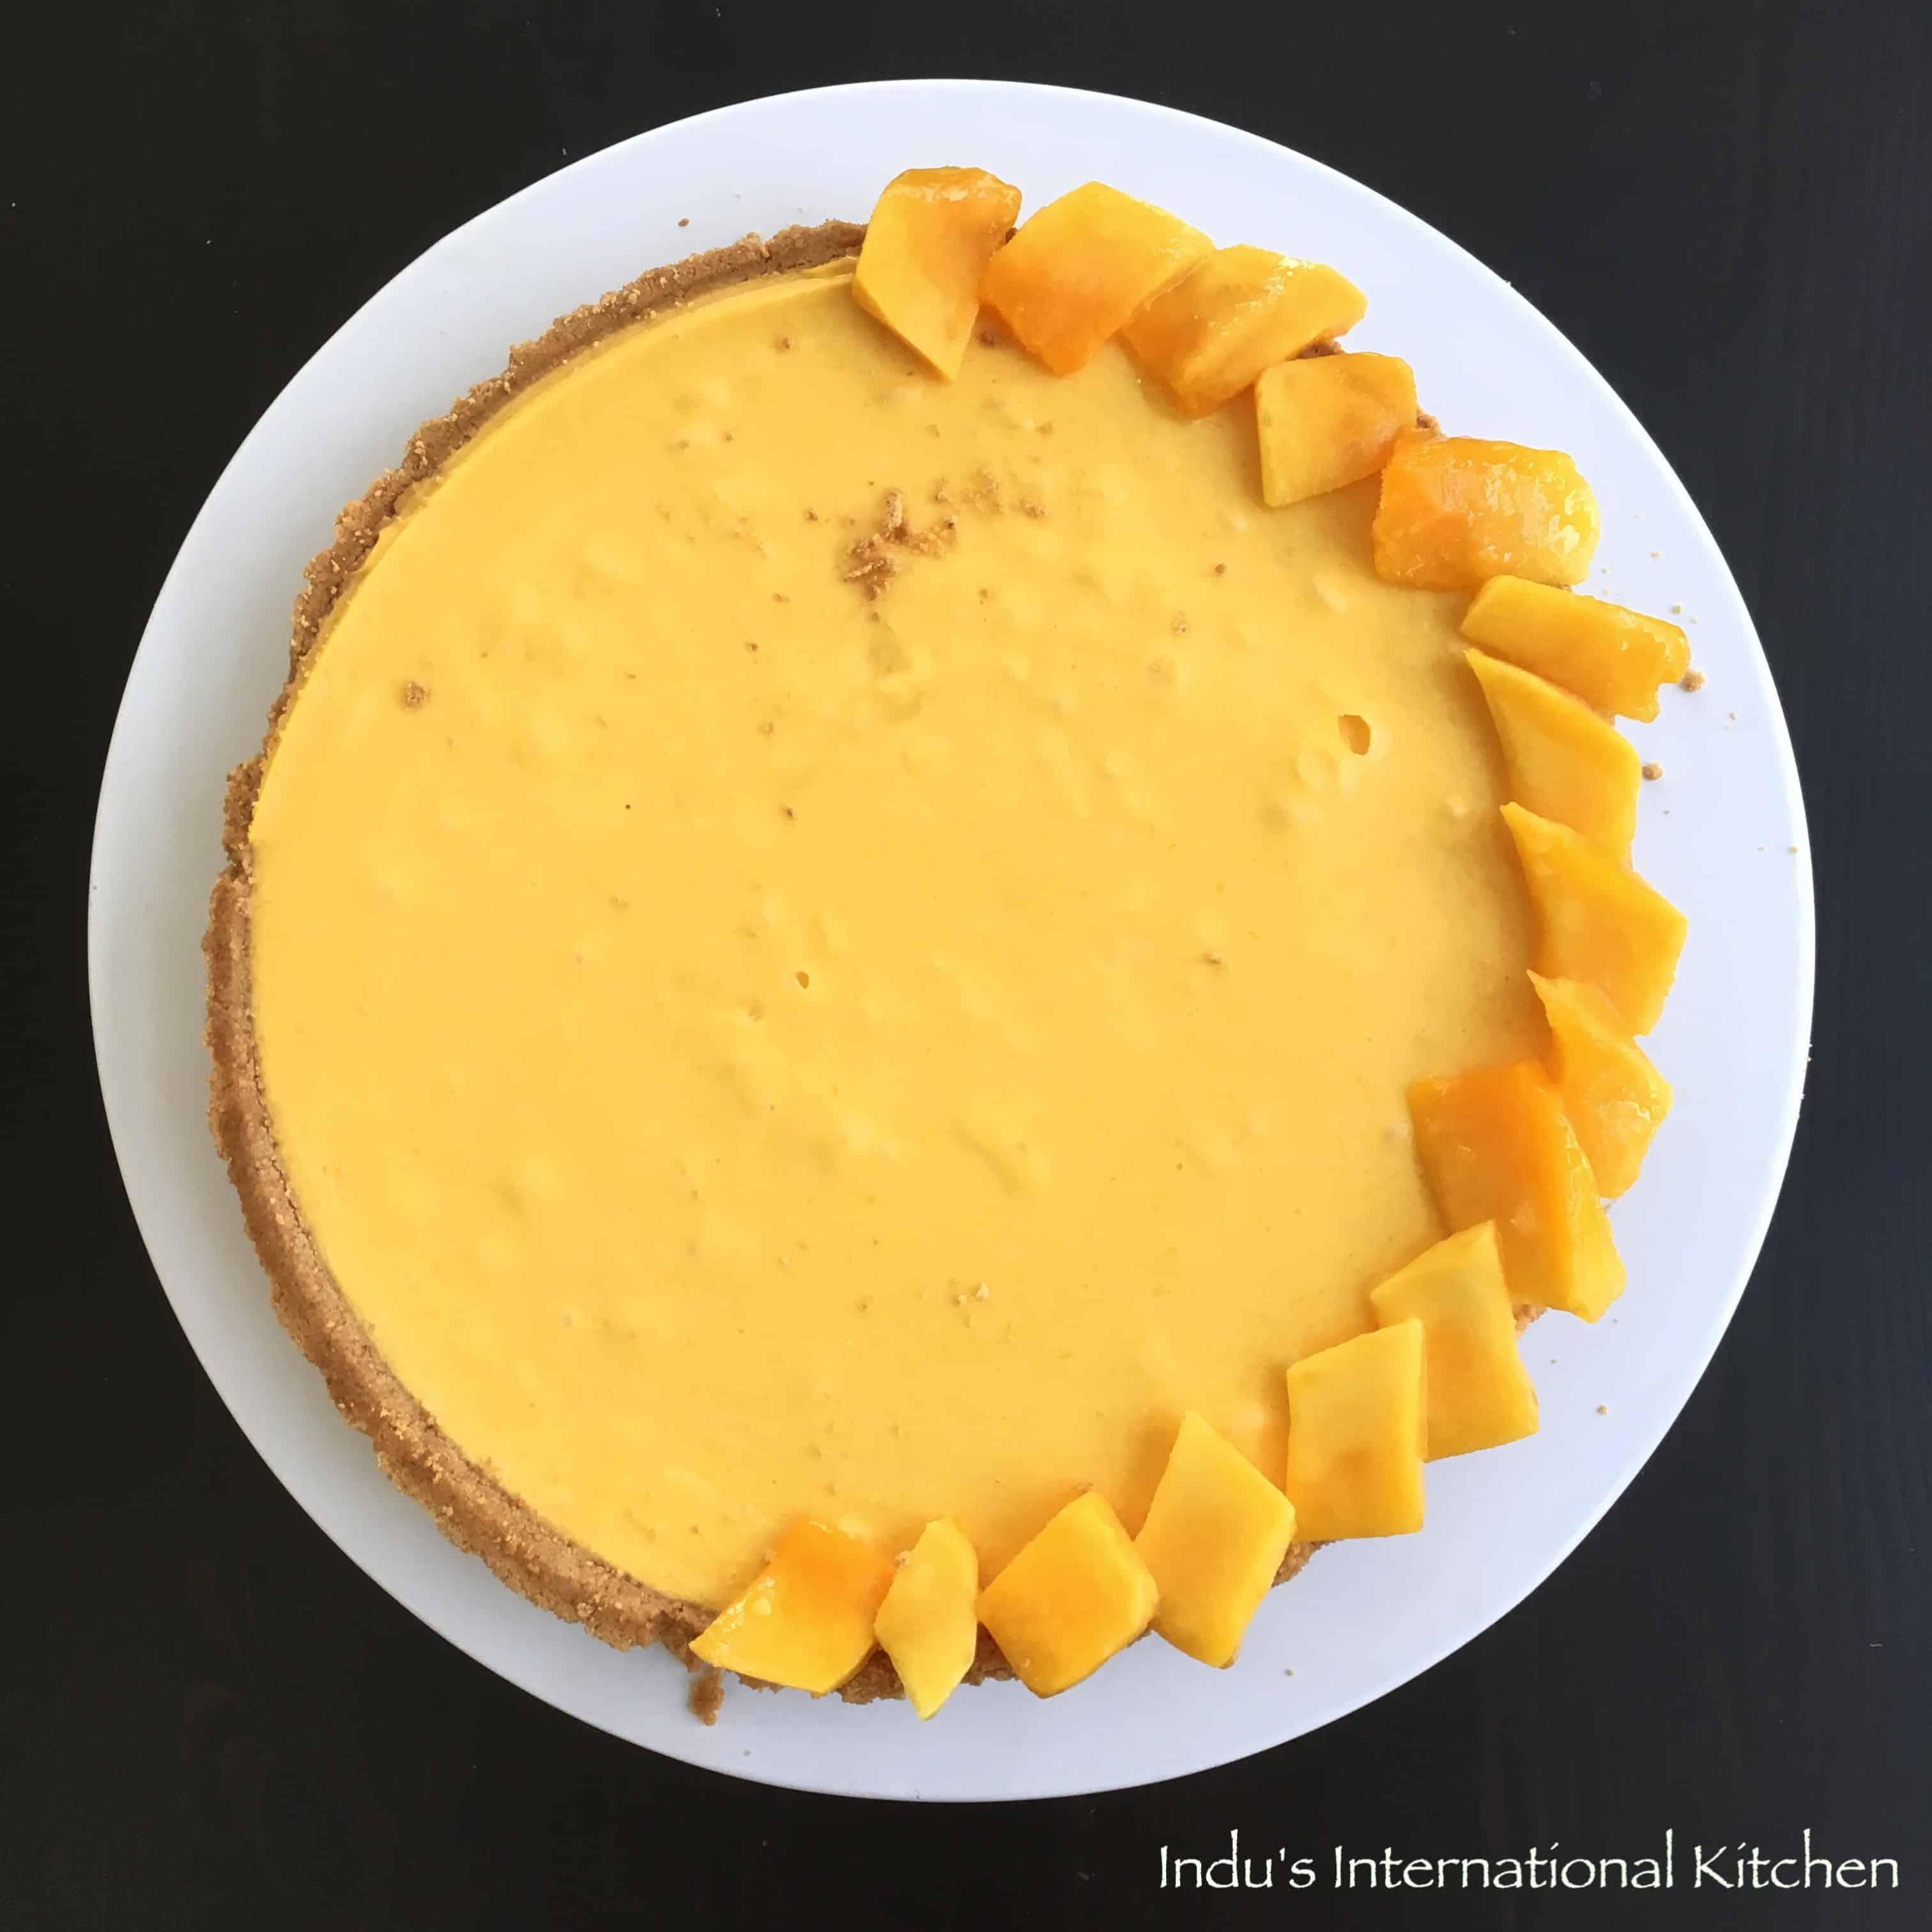 kek mangga azie kitchen resepi mango cheesecake azie kitchen mangga   pic bawah Resepi Kek Batik Durian Enak dan Mudah